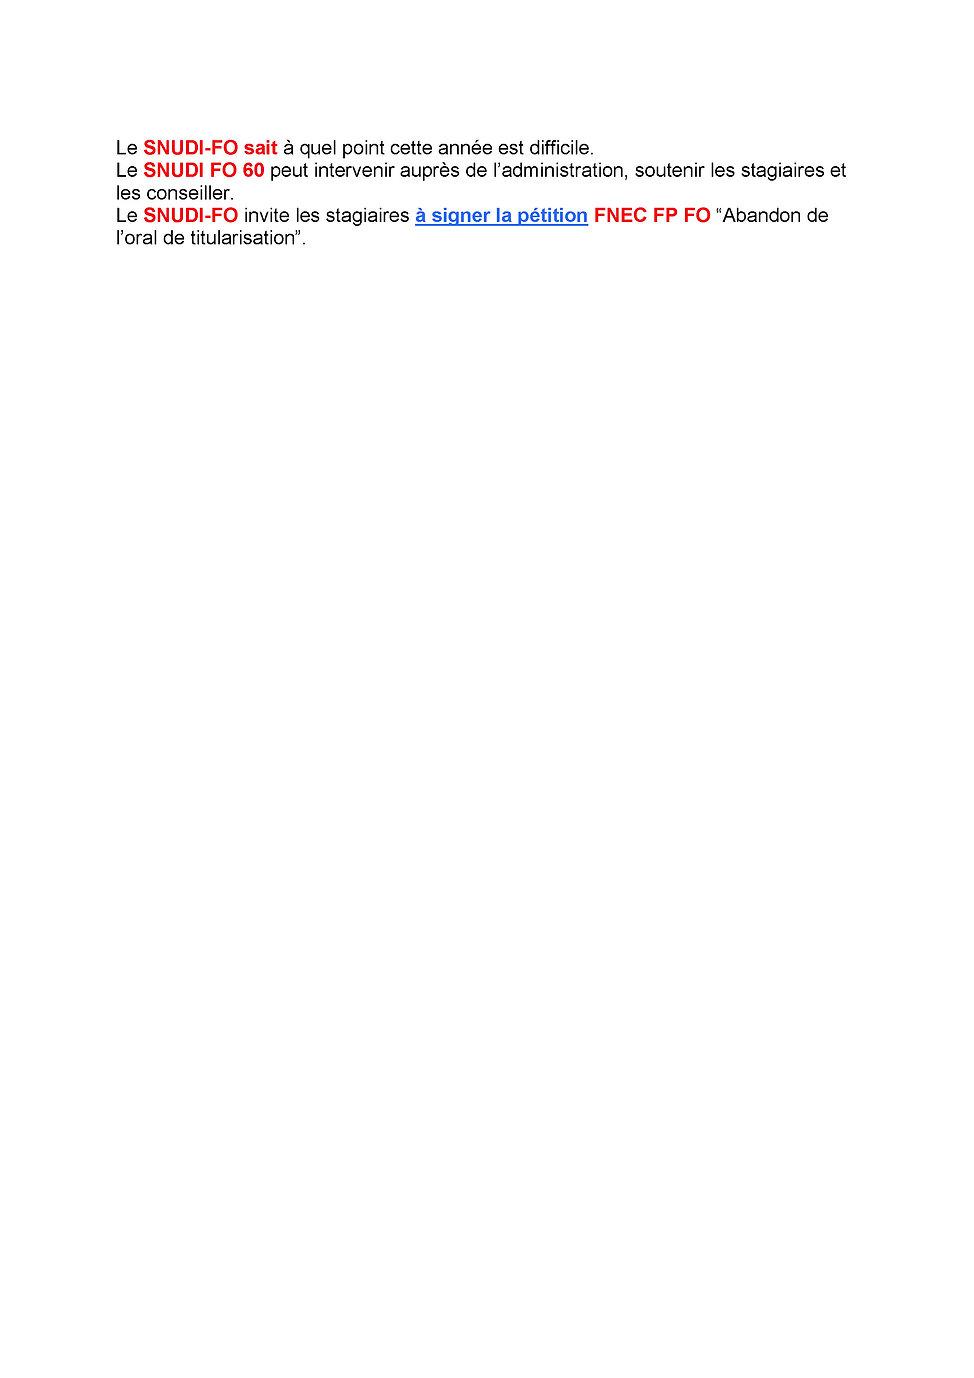 Document1(6).jpg